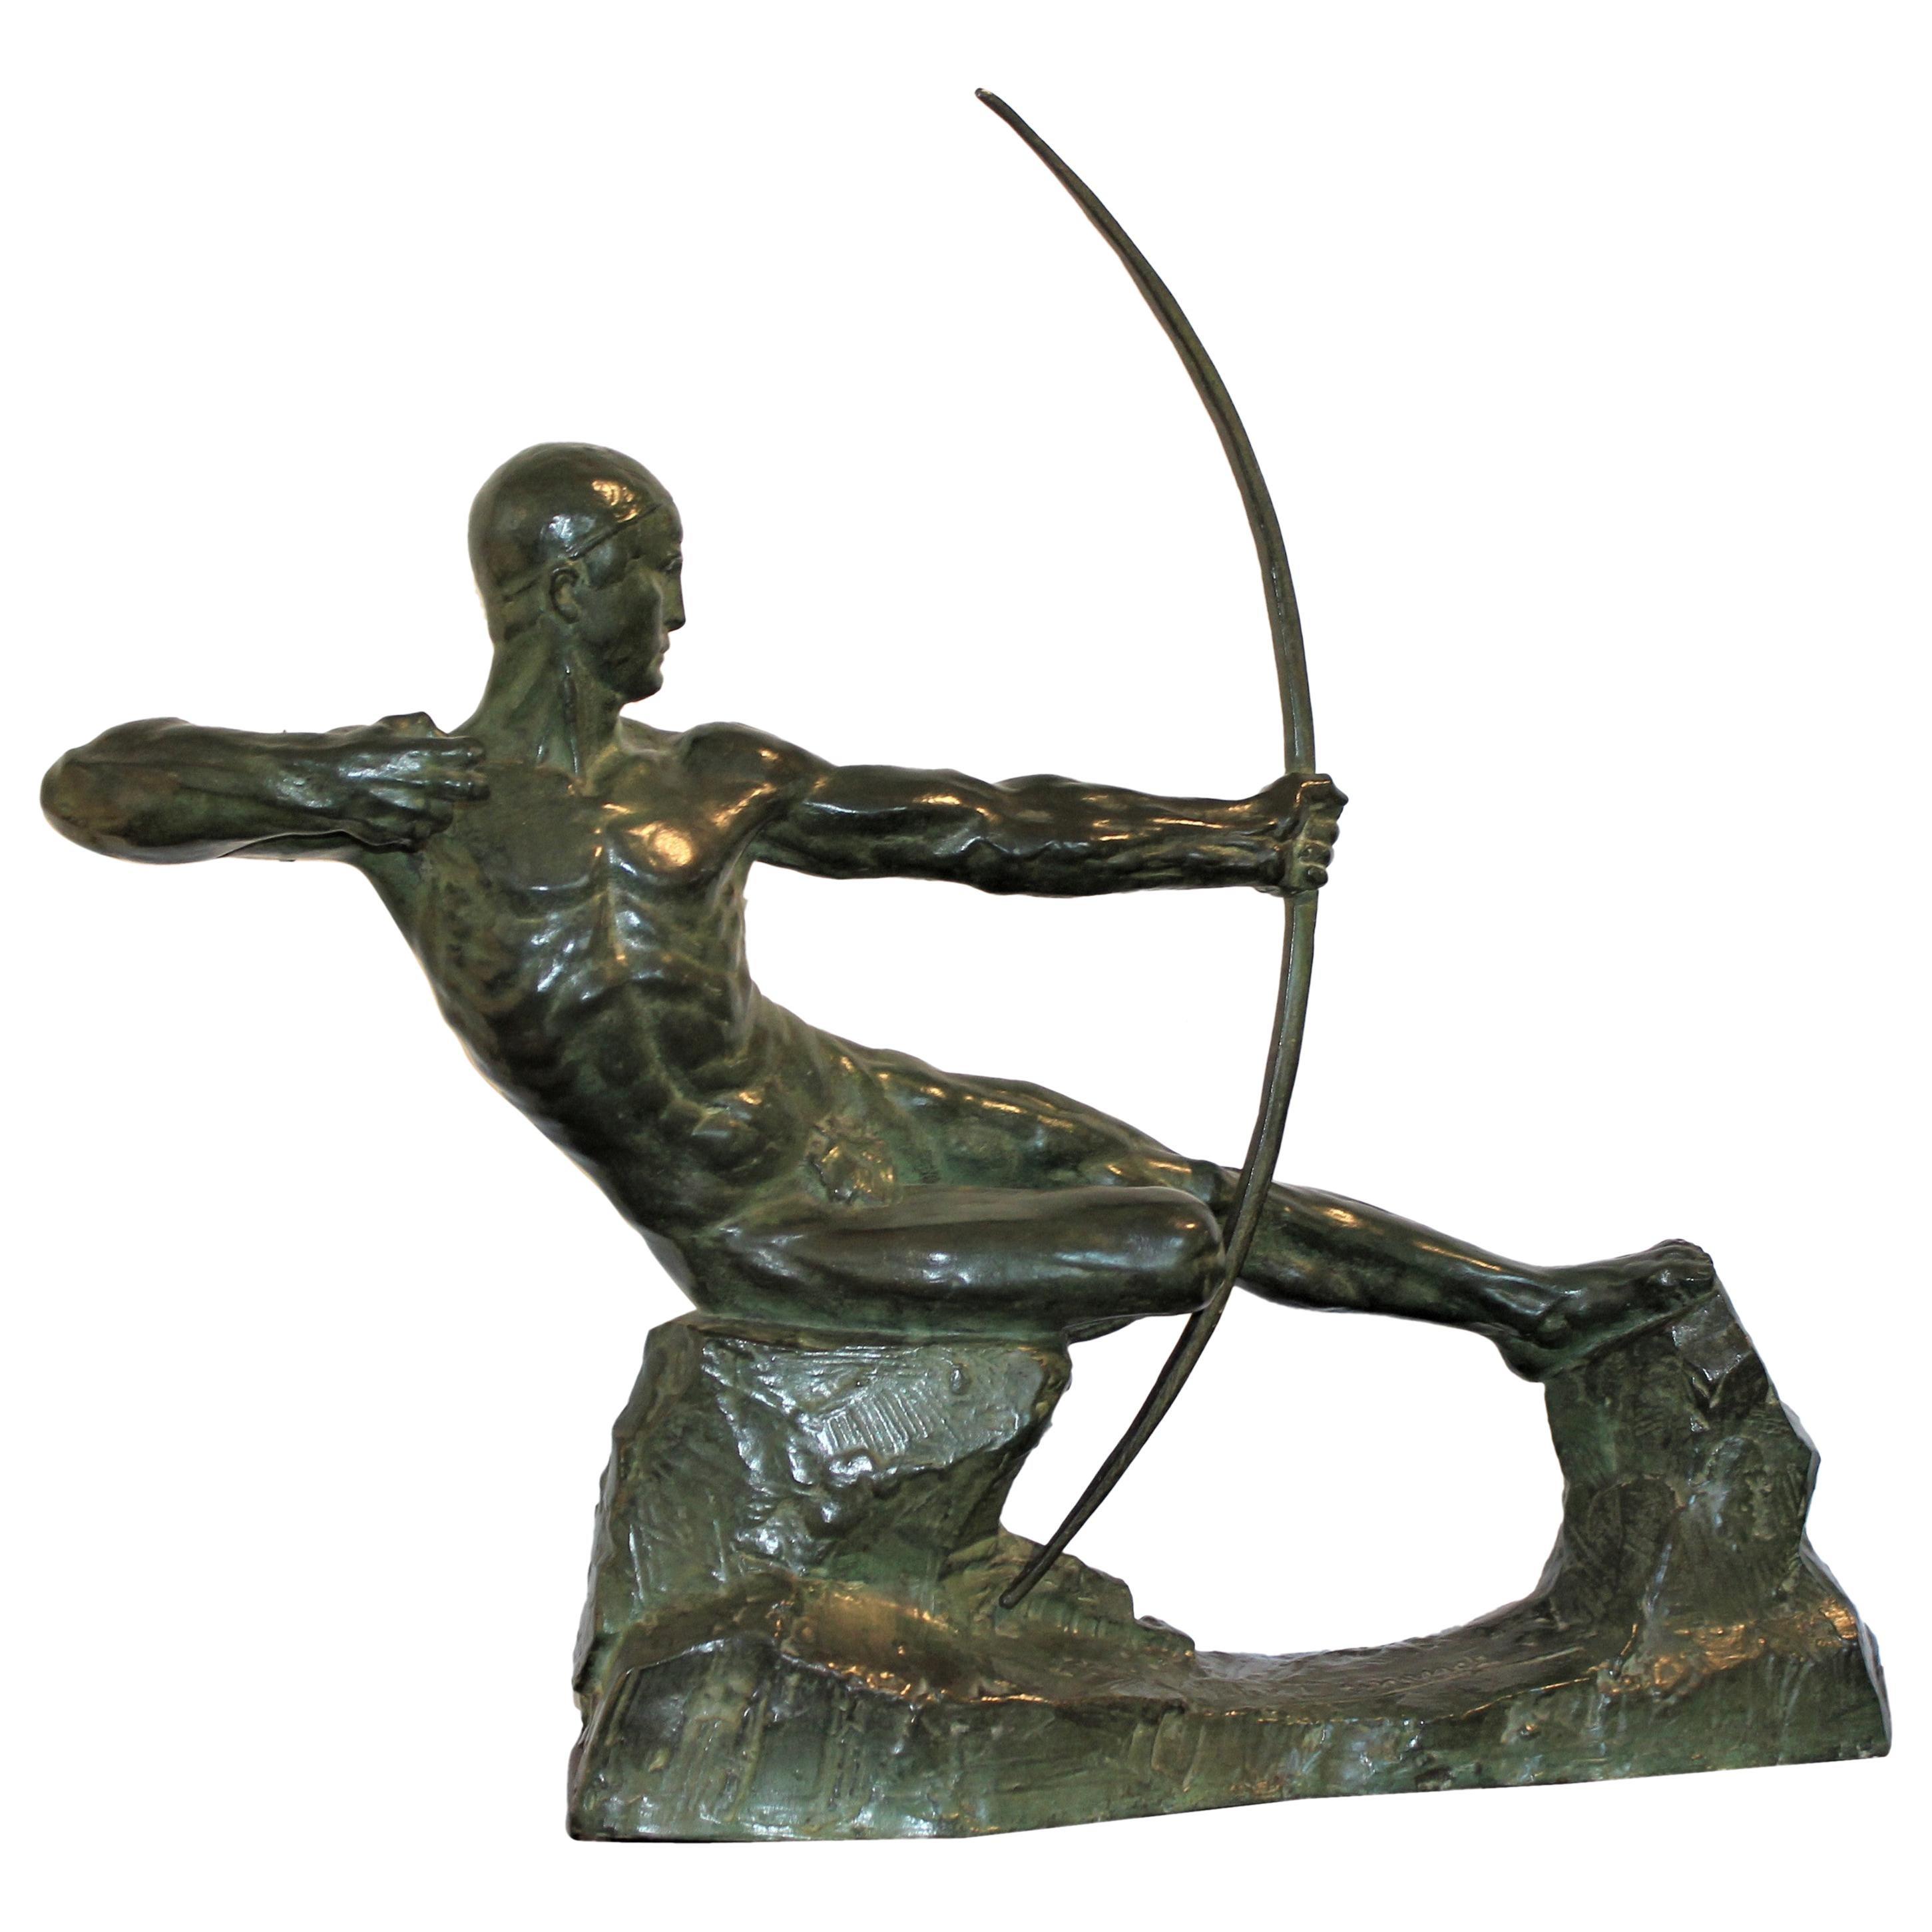 Art Deco Bronze Sculpture of an Archer by Victor Demanet